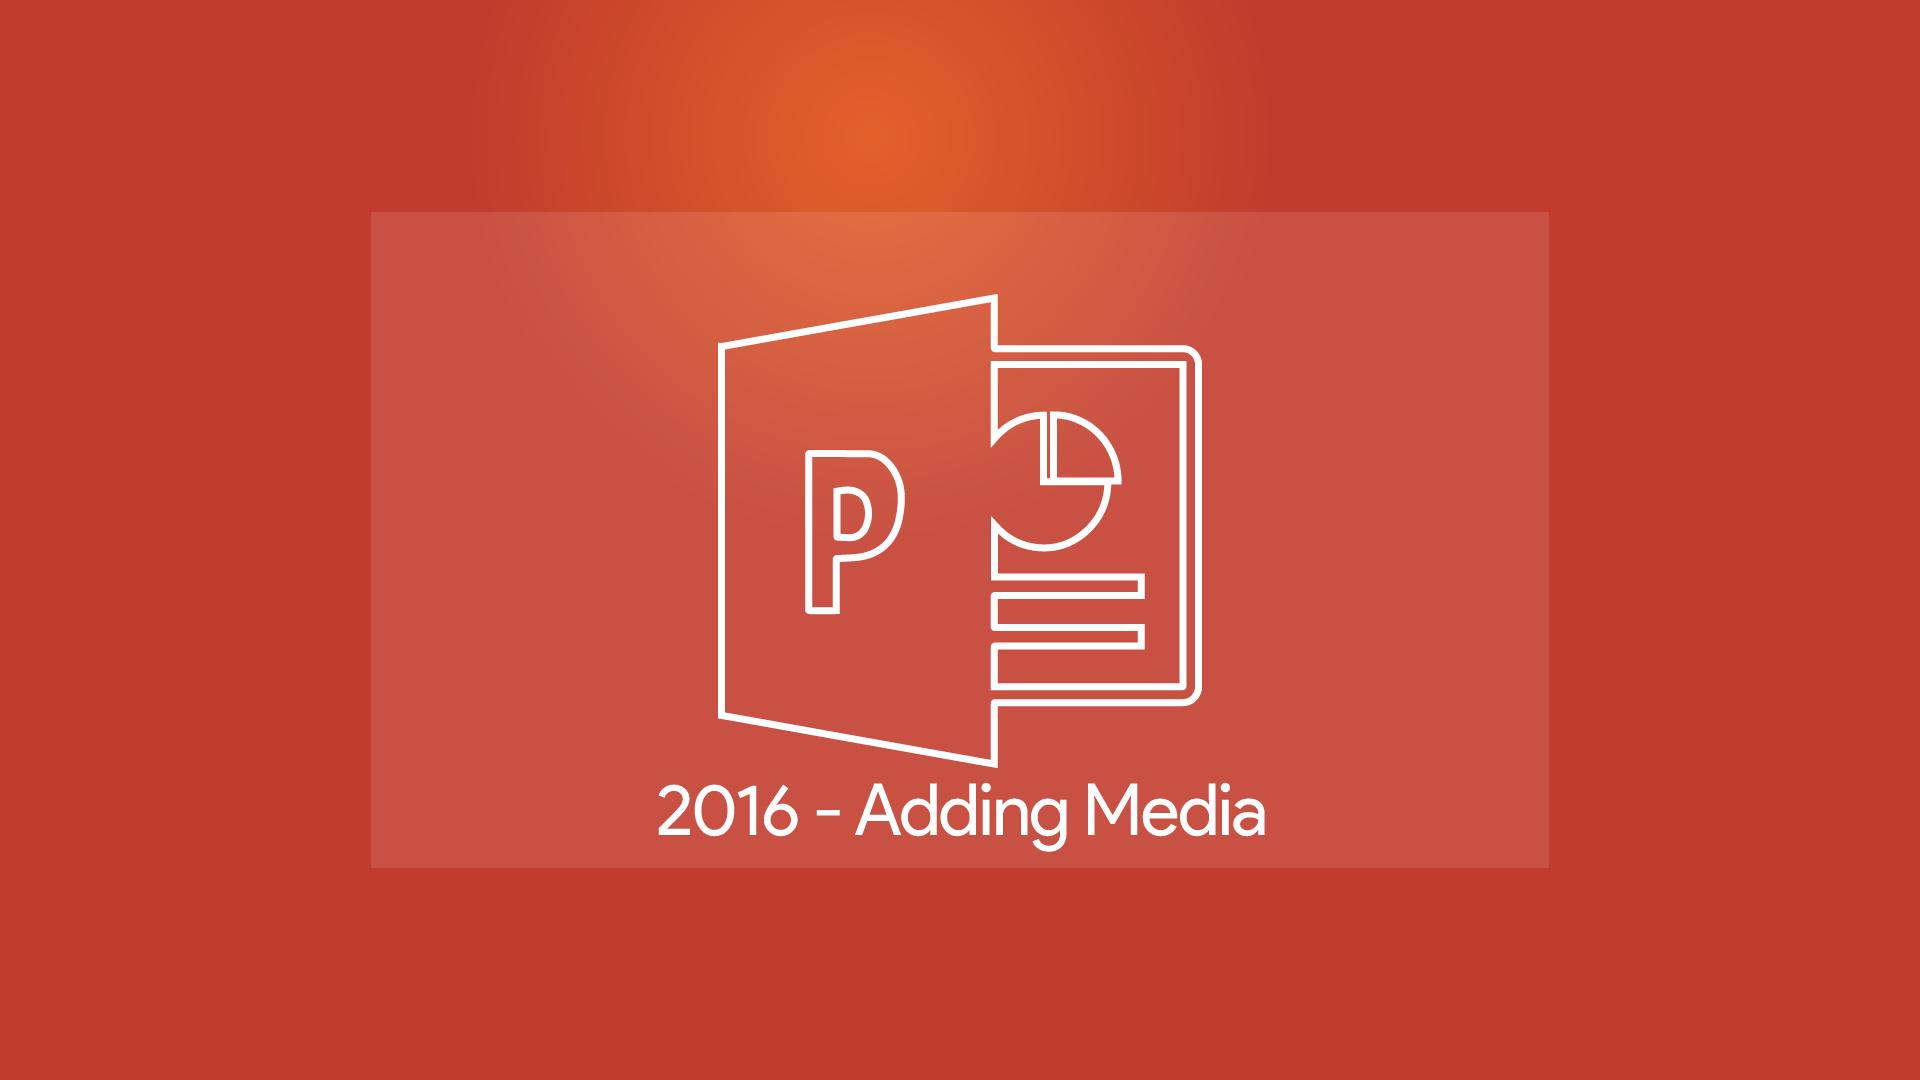 PowerPoint 2016 - Adding Media